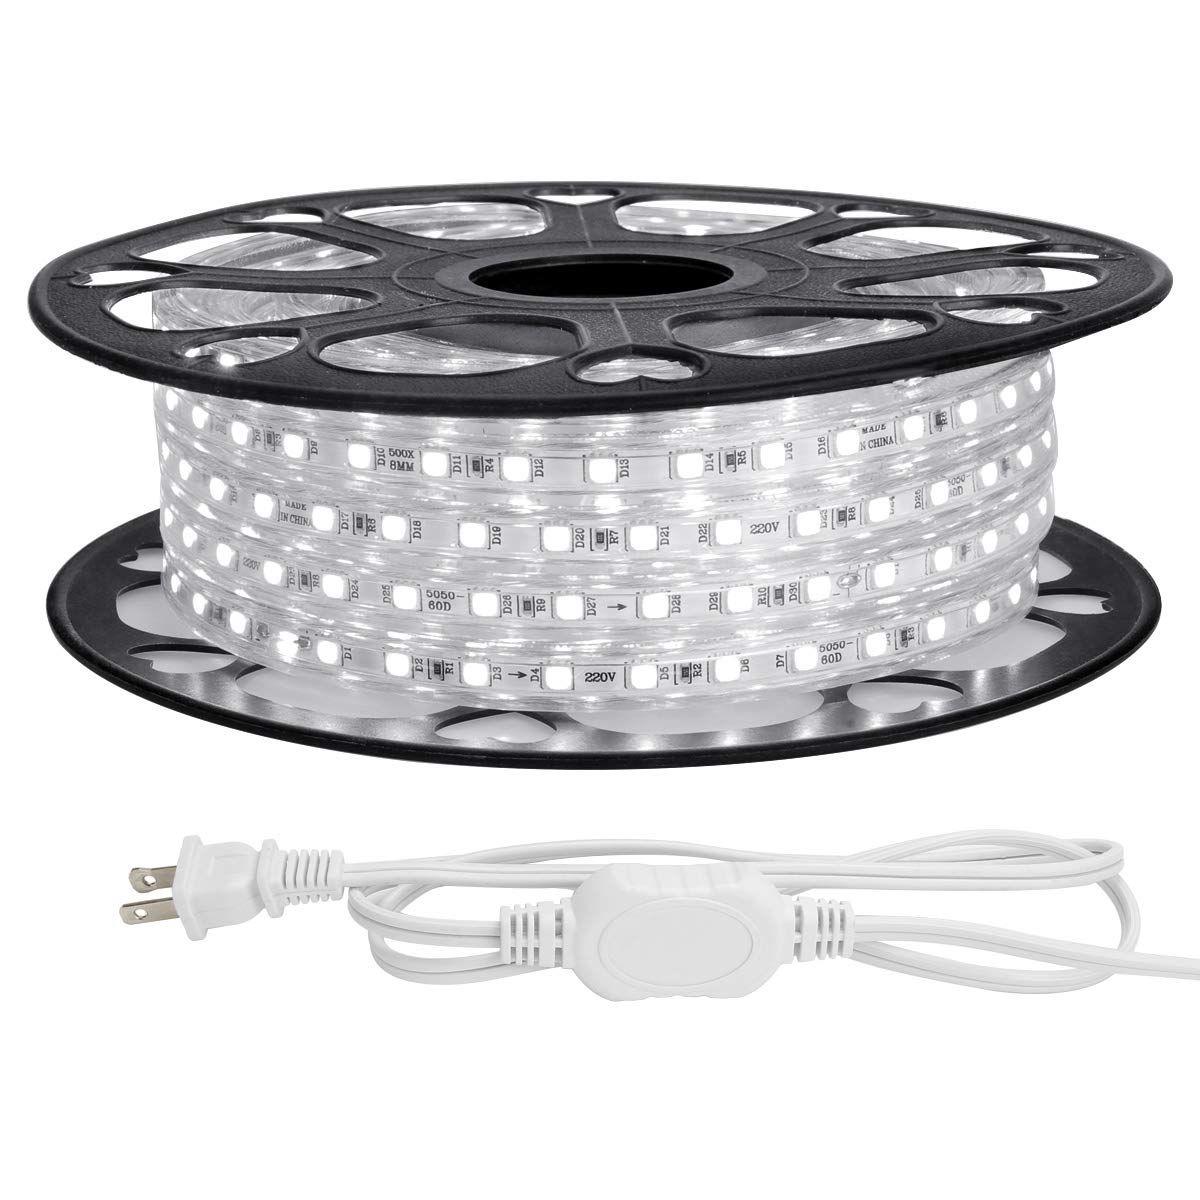 Le 49ft Led Strip Lights 120 Volt 115w 900 Smd 5050 Leds Waterproof Flexible Daylight White Etl Listed Indoor Outdoor L Led Rope Lights Strip Lighting Led Curtain Lights